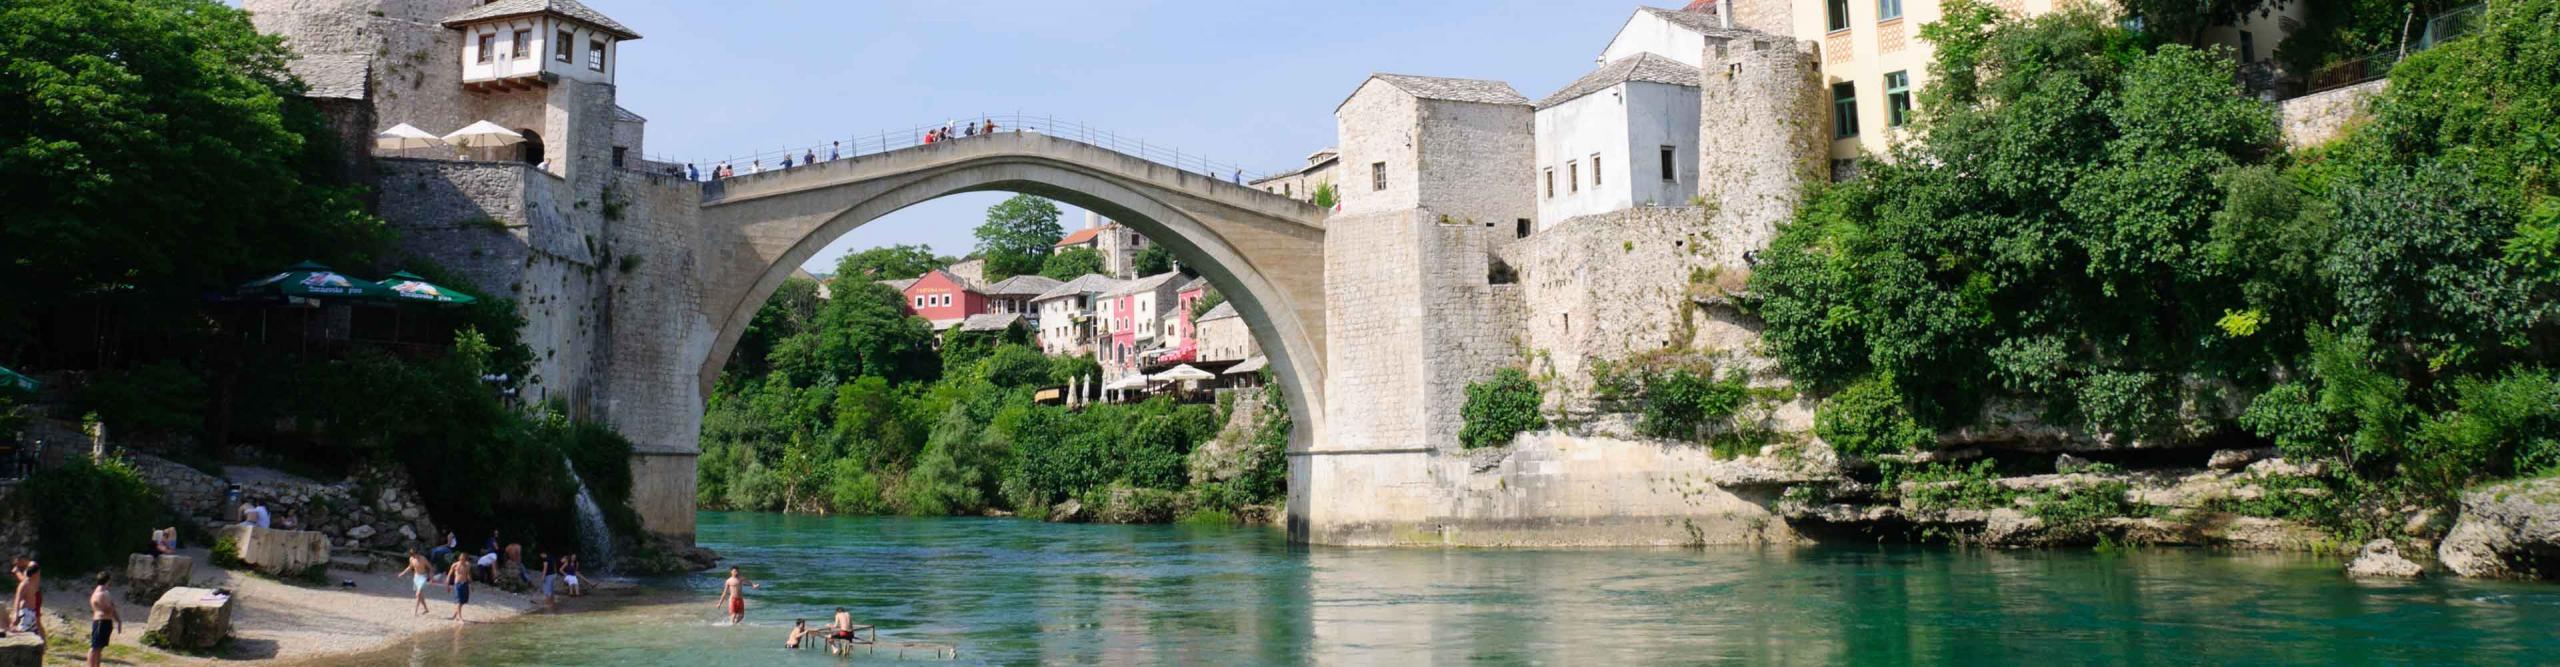 Bosnia & Herzegovina Tours | Peregrine Adventures AU